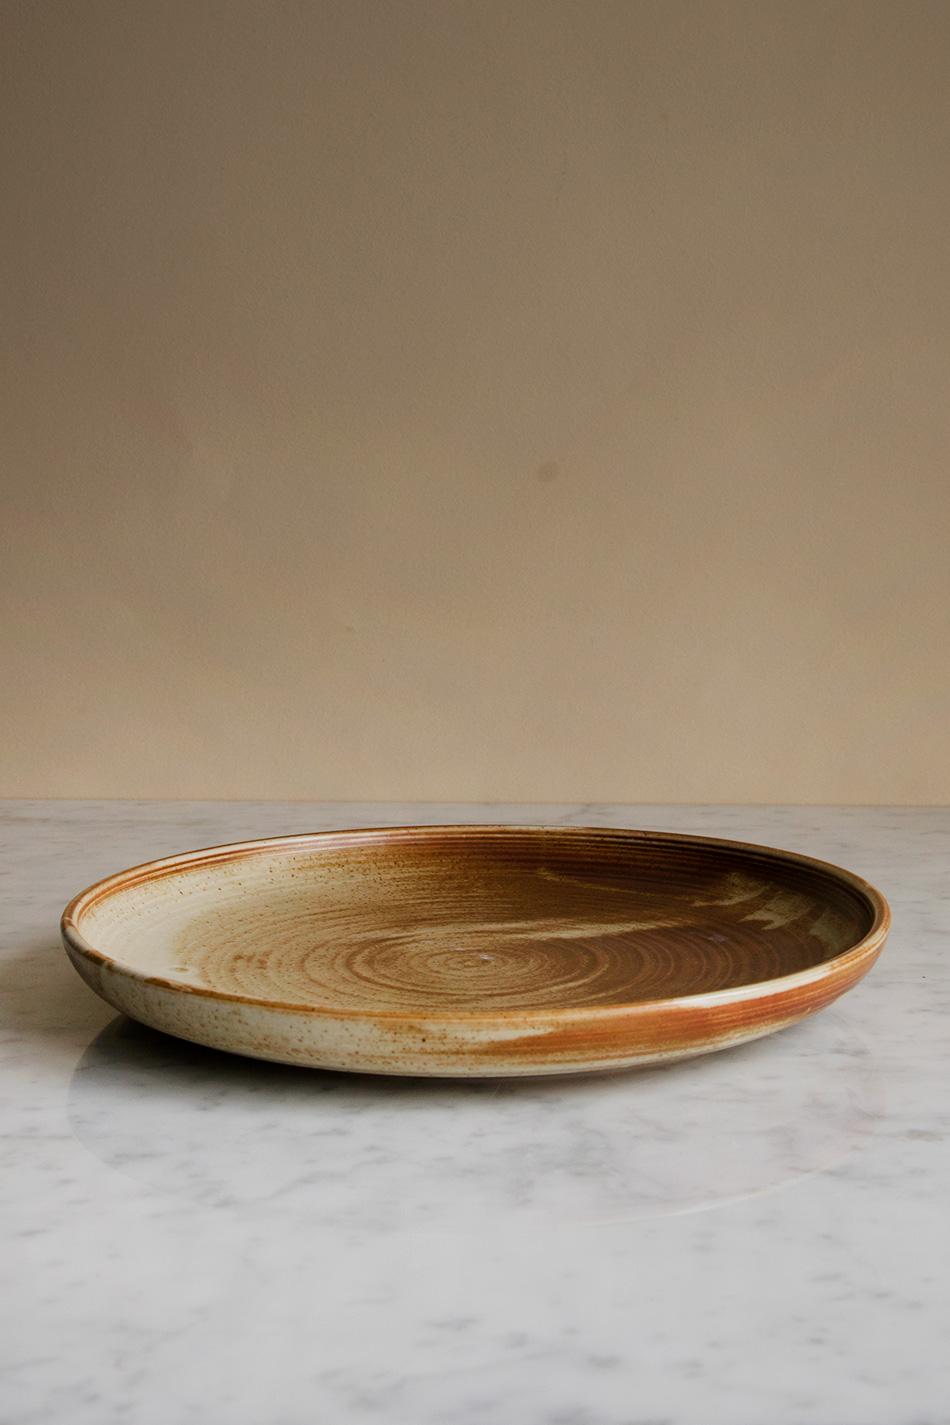 Kyoto Rustic Dinner Plate